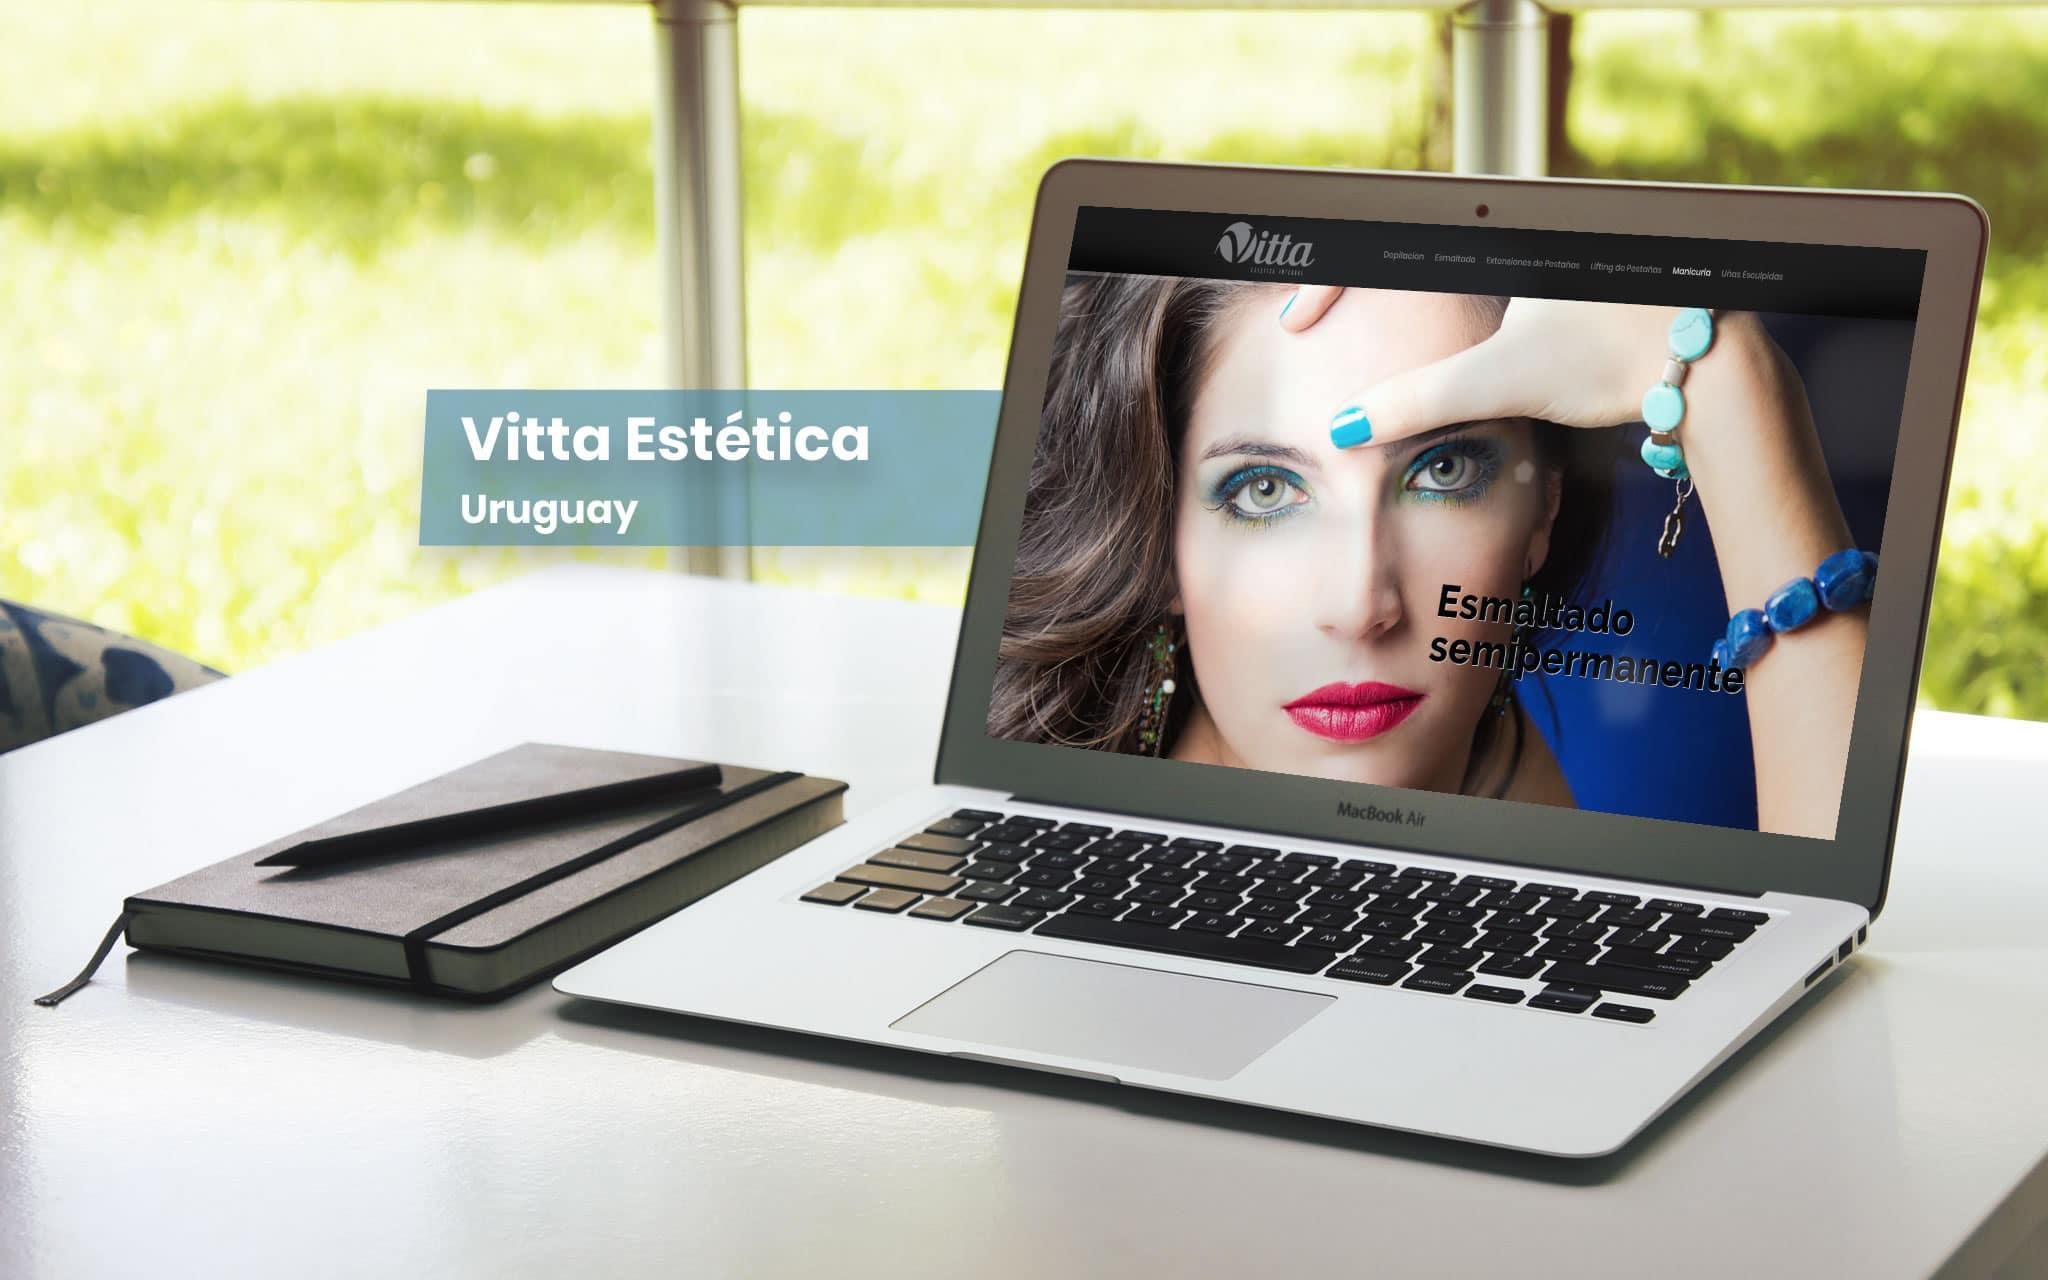 Vitta Estética - Uruguay